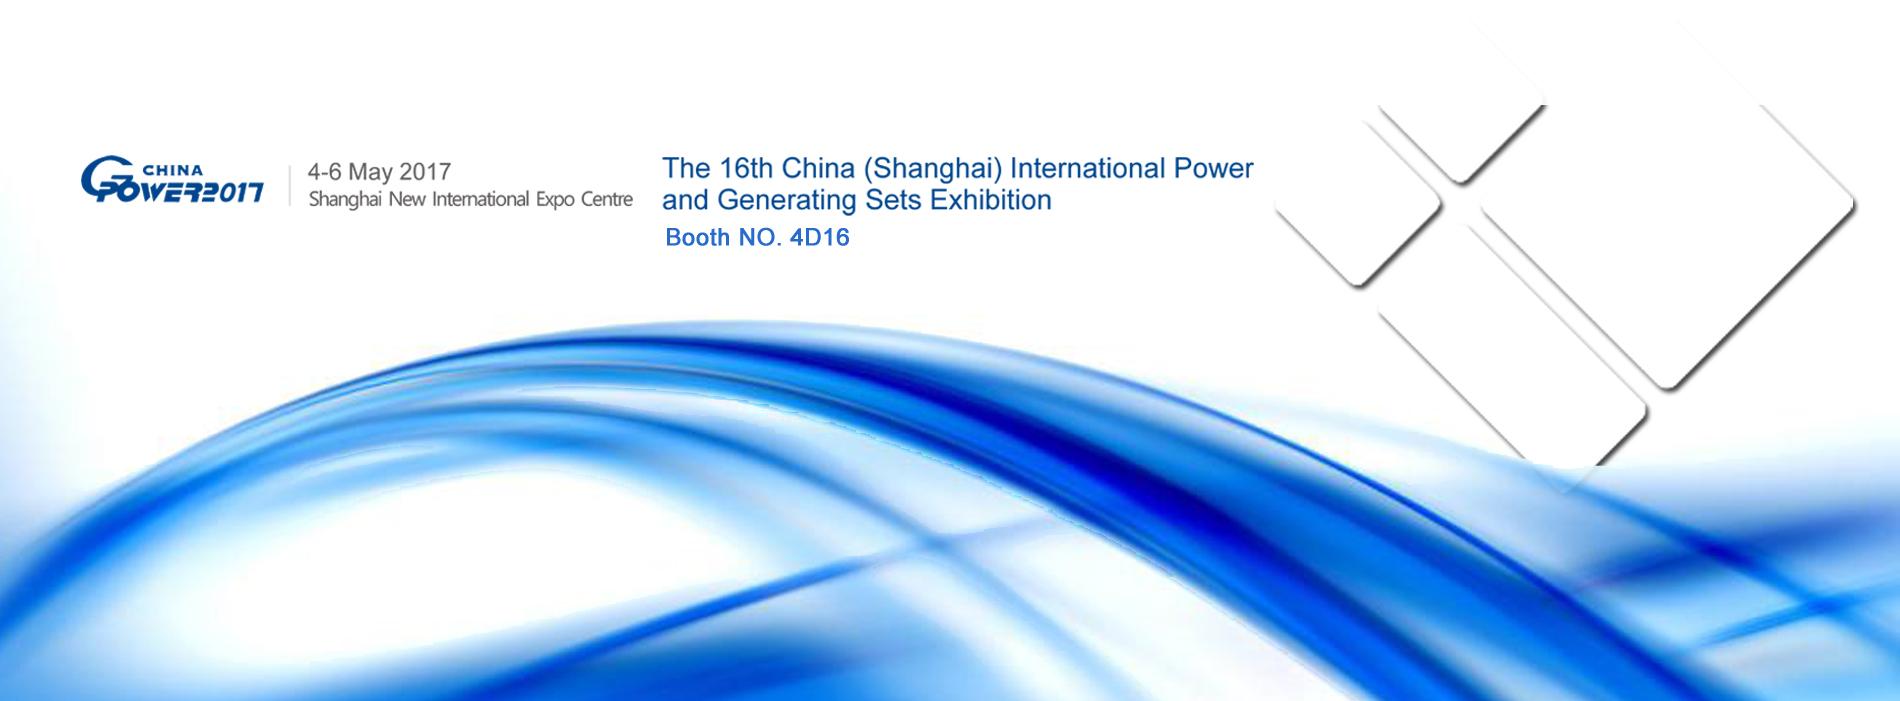 The 16th China (Shanghai) International Power and Generating Set